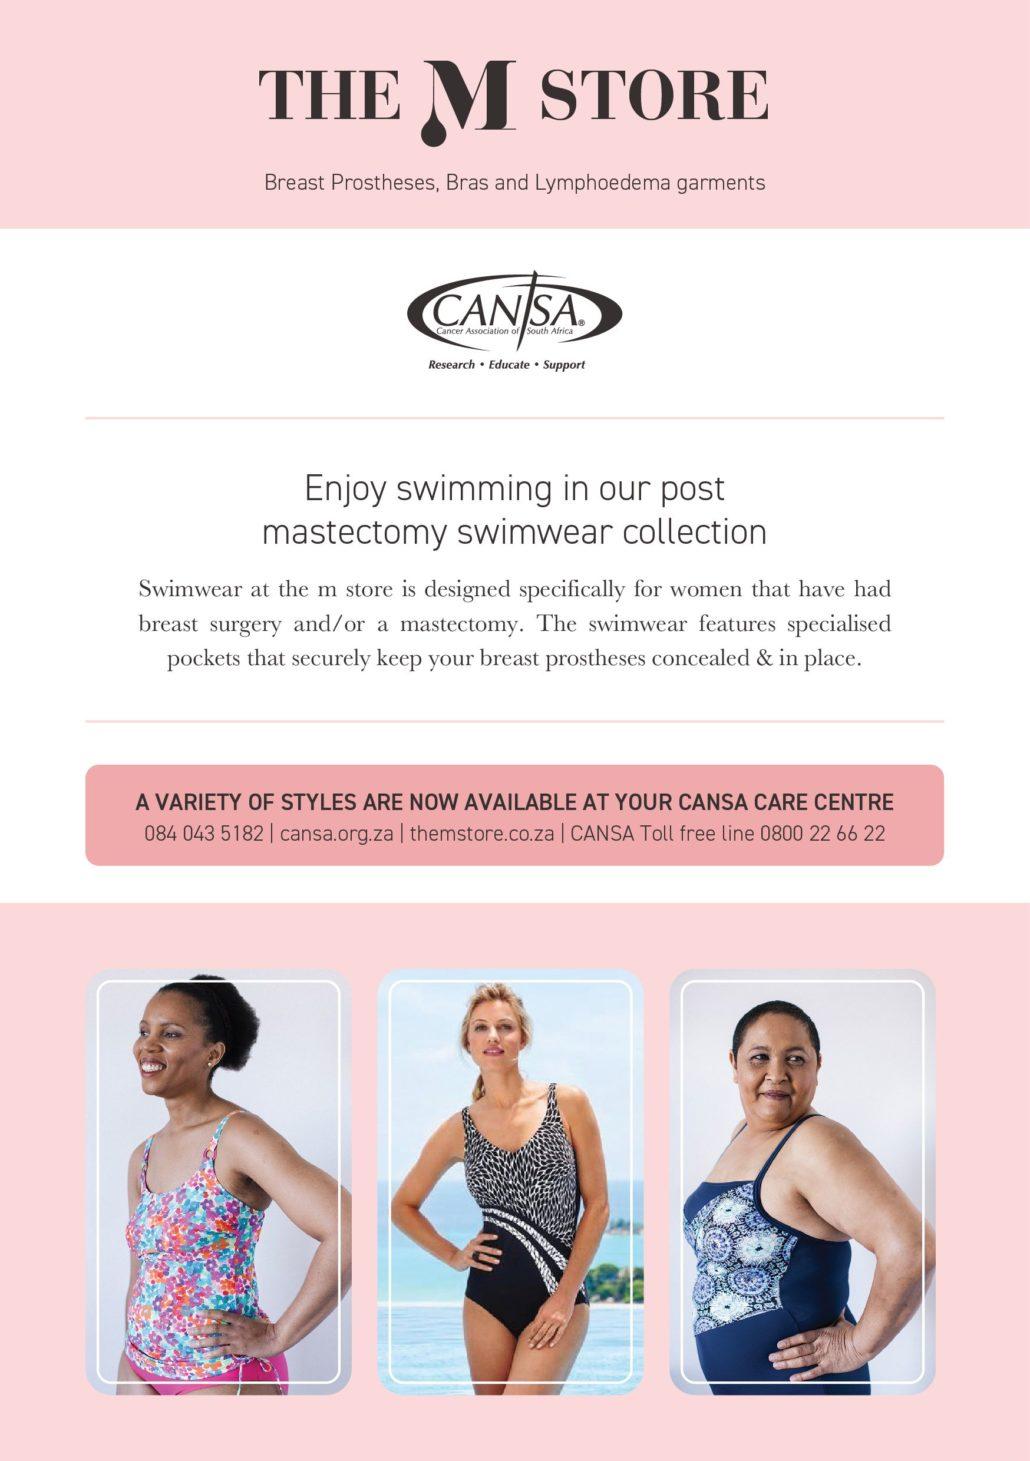 m store & cansa partnership restoring femininity, confidence